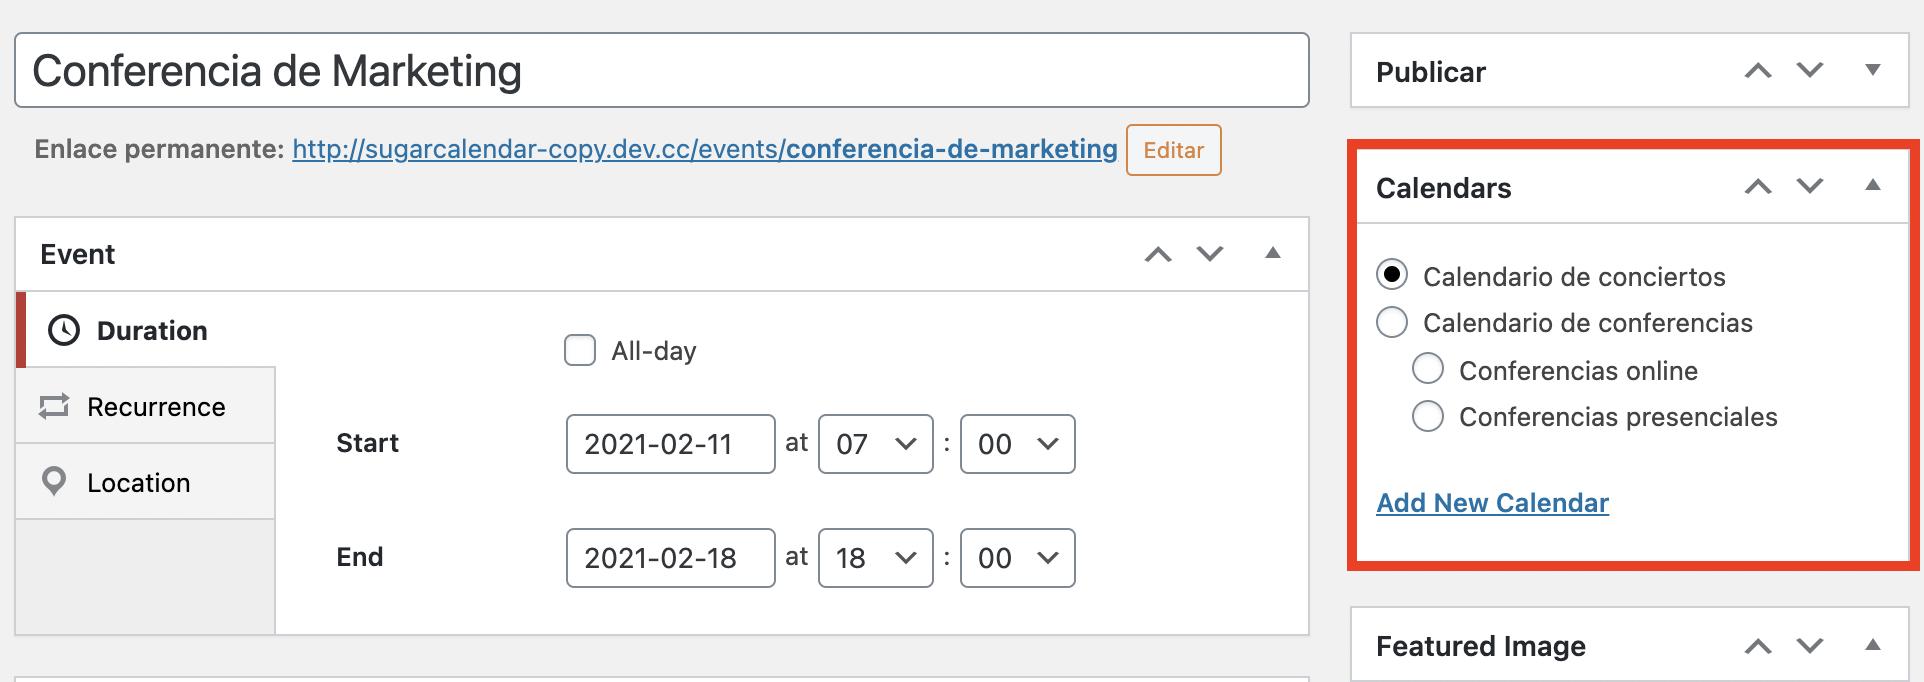 Poner eventos en distintos calendarios